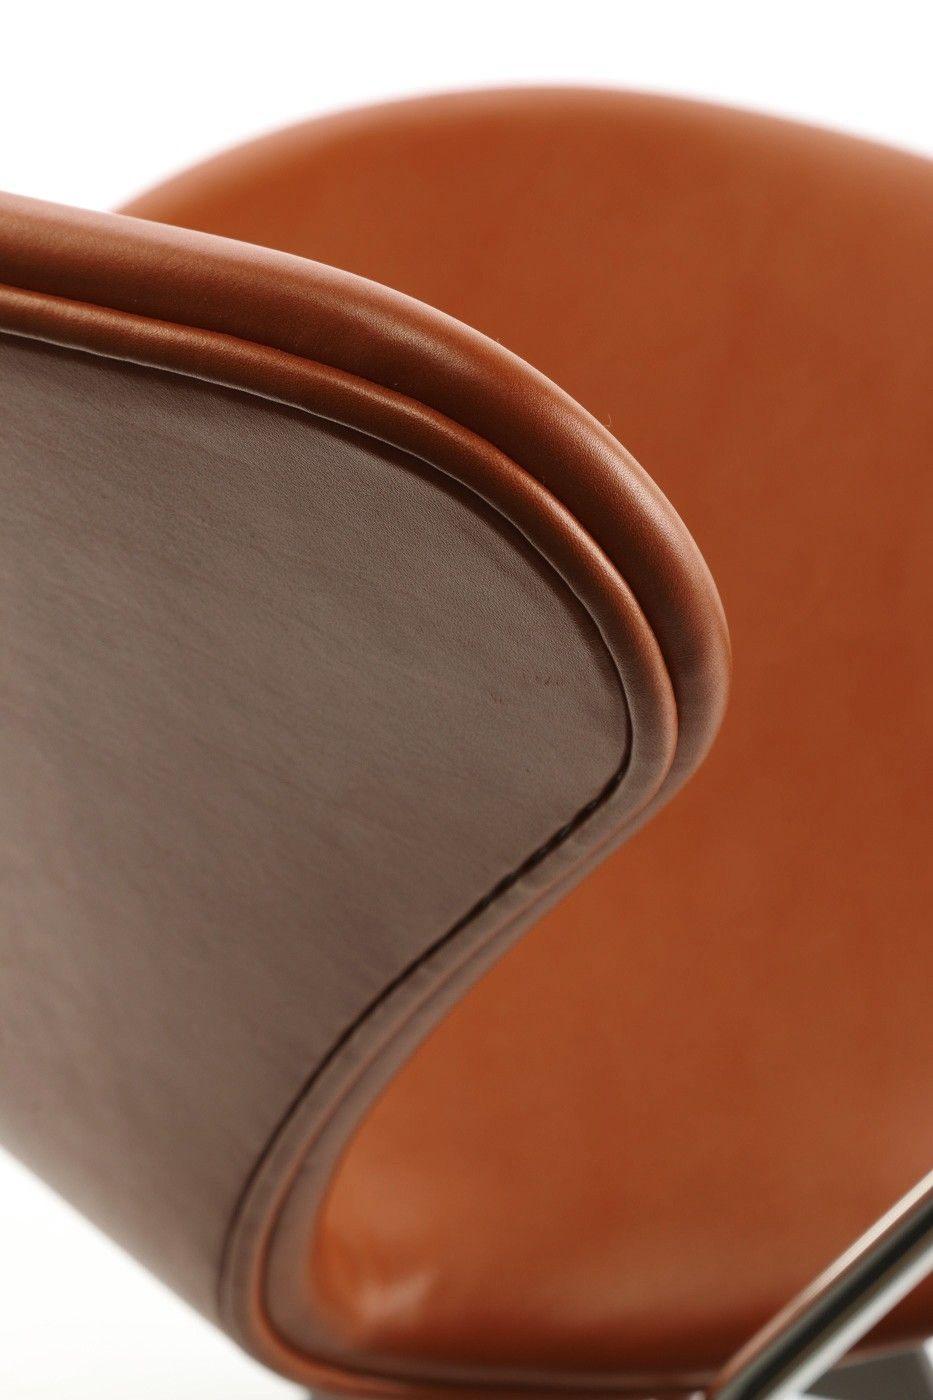 Arne Jacobsen Syverstole model 3107 elegance Walnut farget